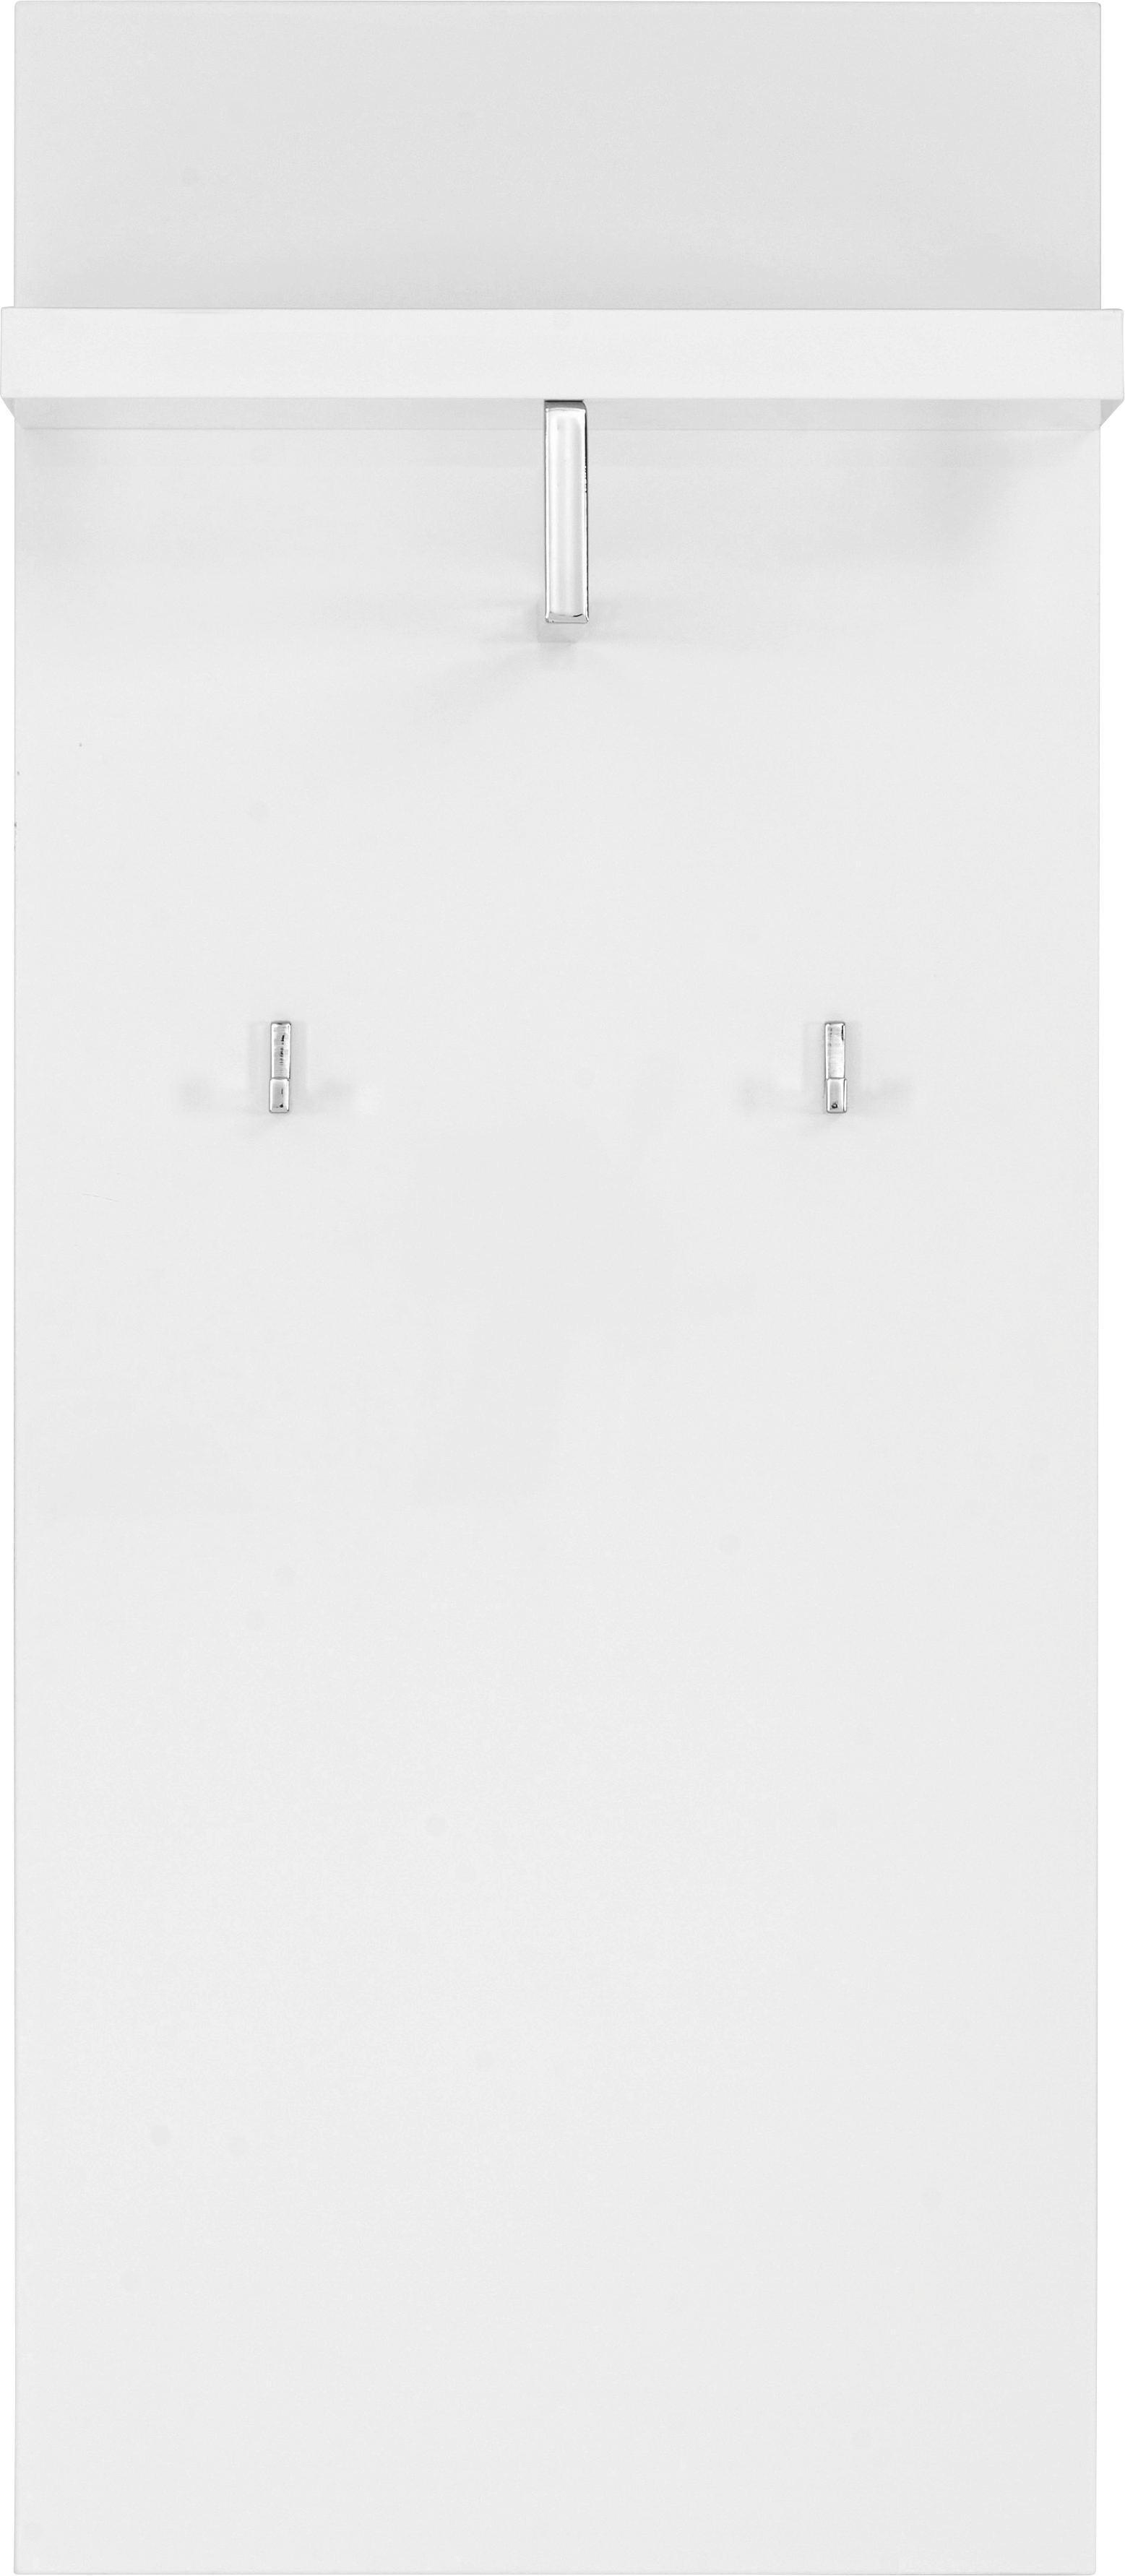 KLÄDHÄNGARE - vit, Design, trä (51/121/25cm) - Carryhome